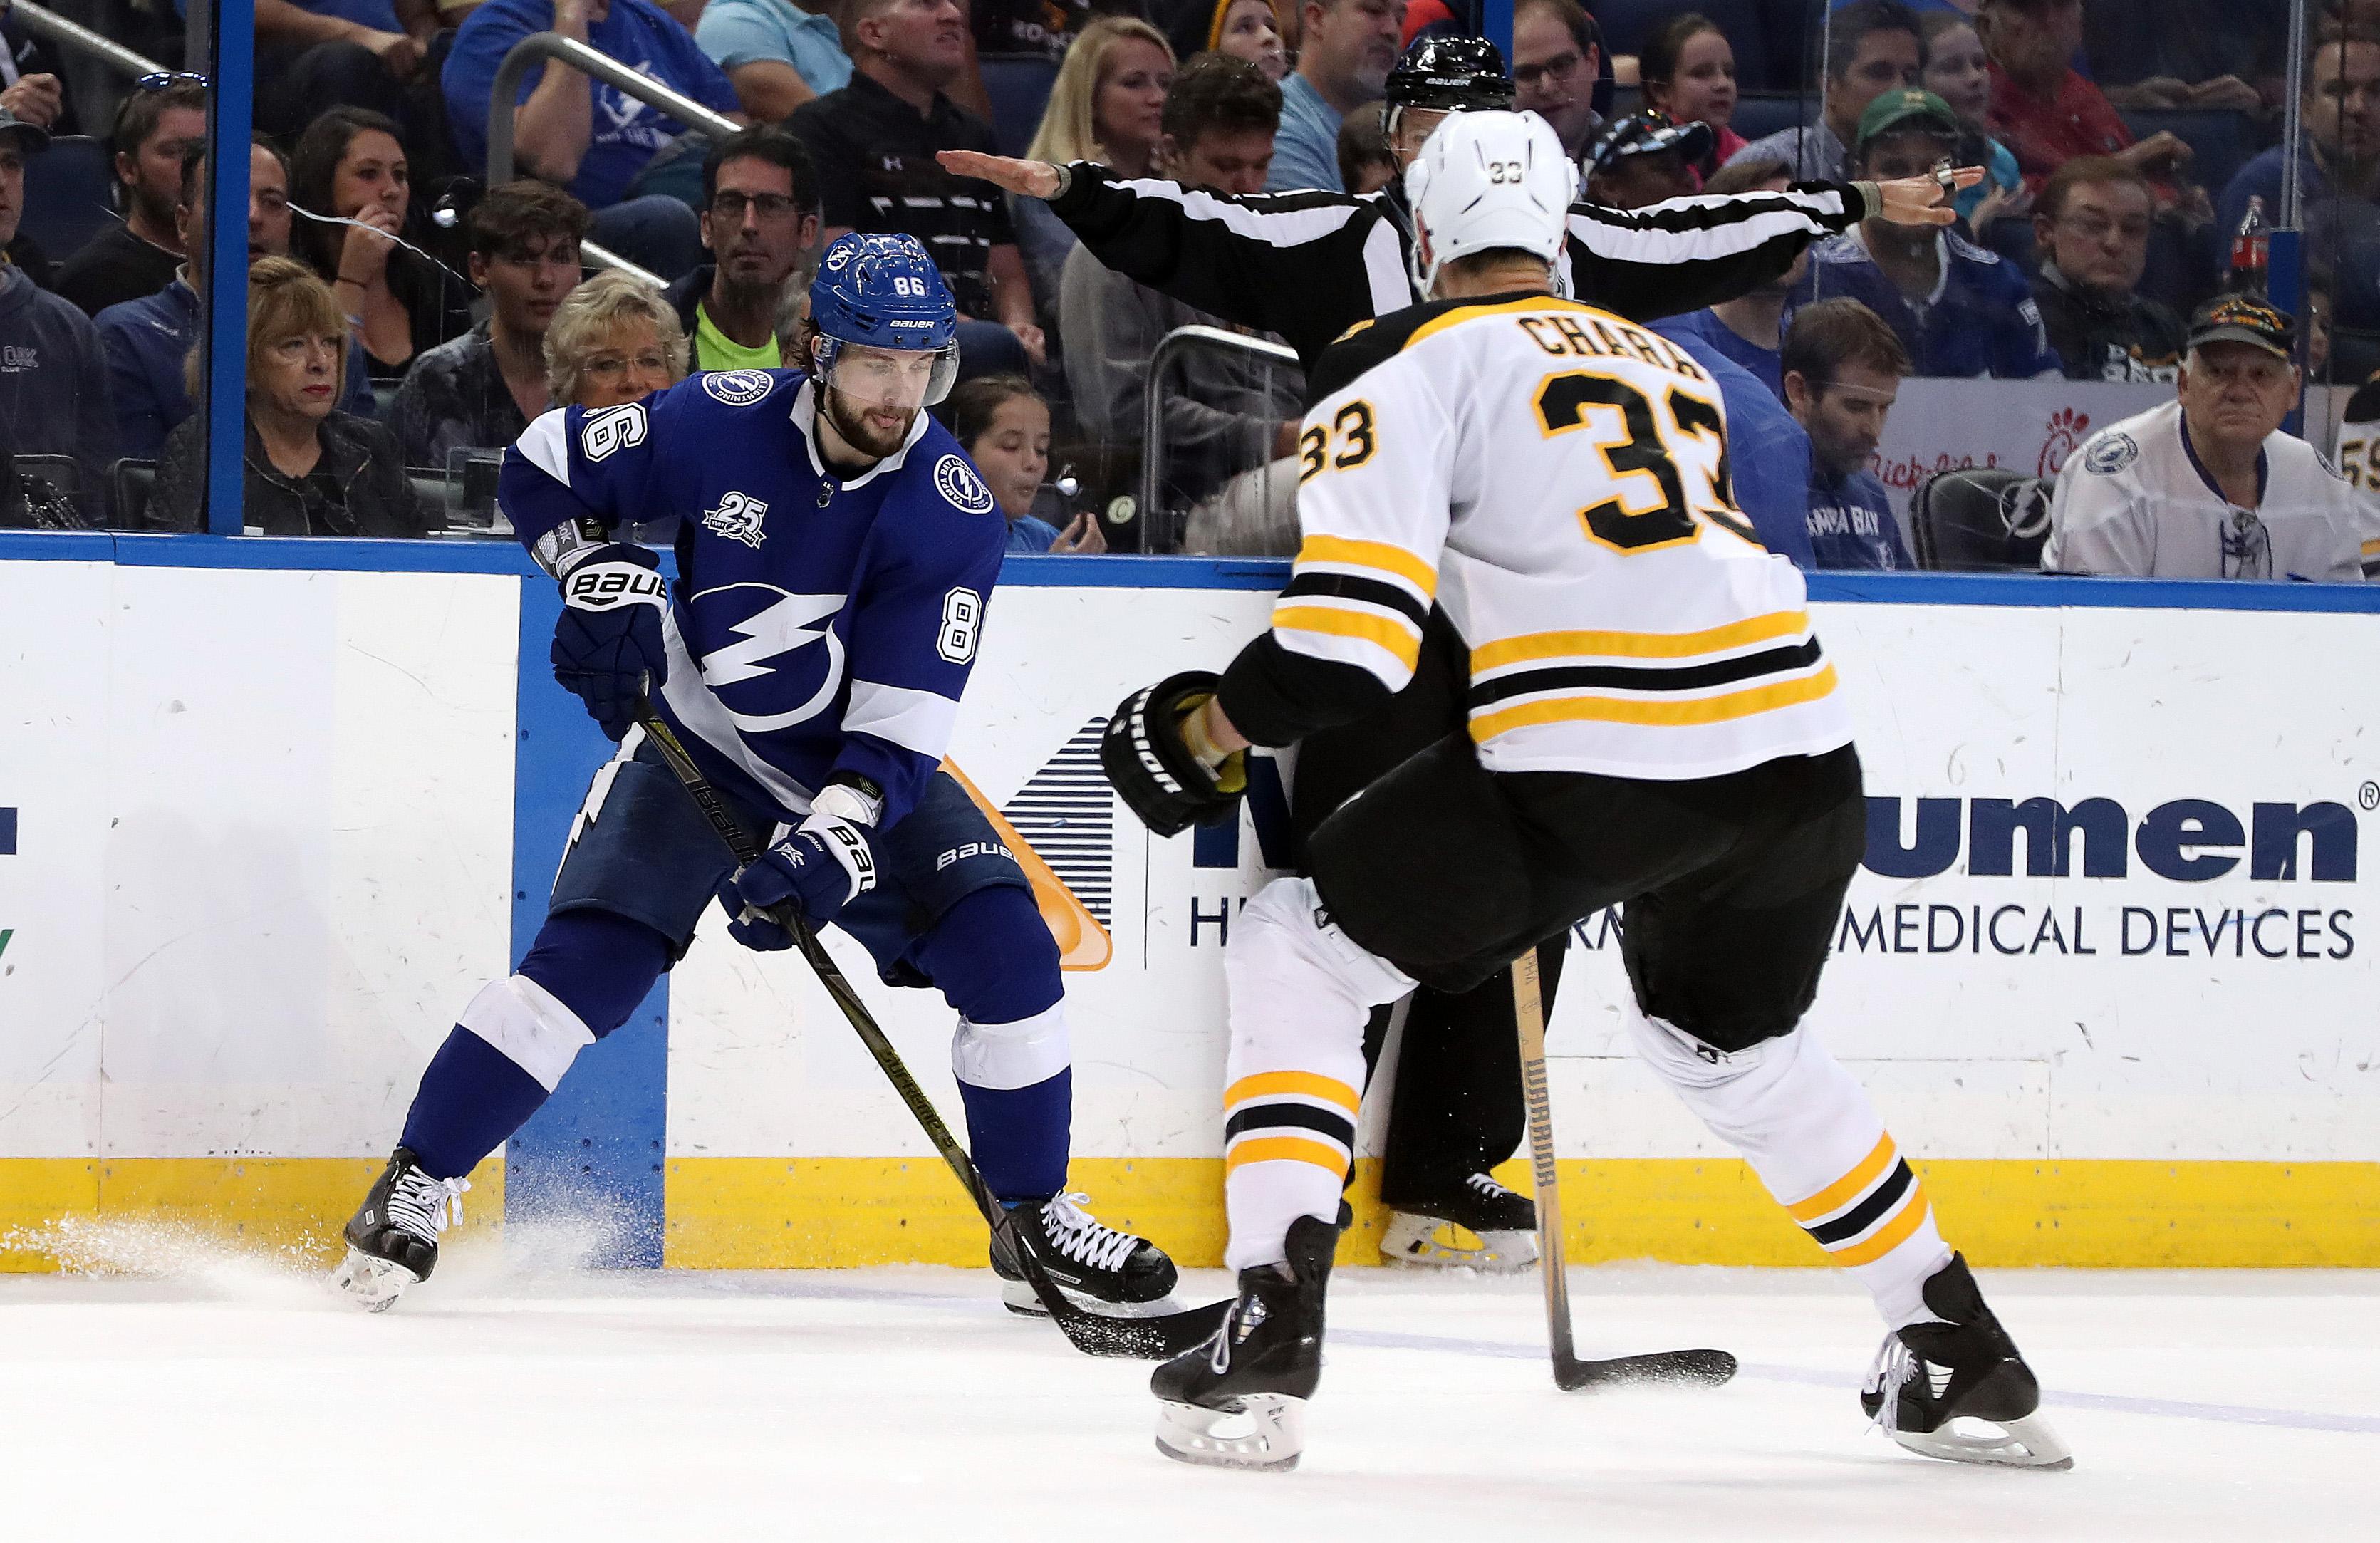 NHL: Boston Bruins at Tampa Bay Lightning